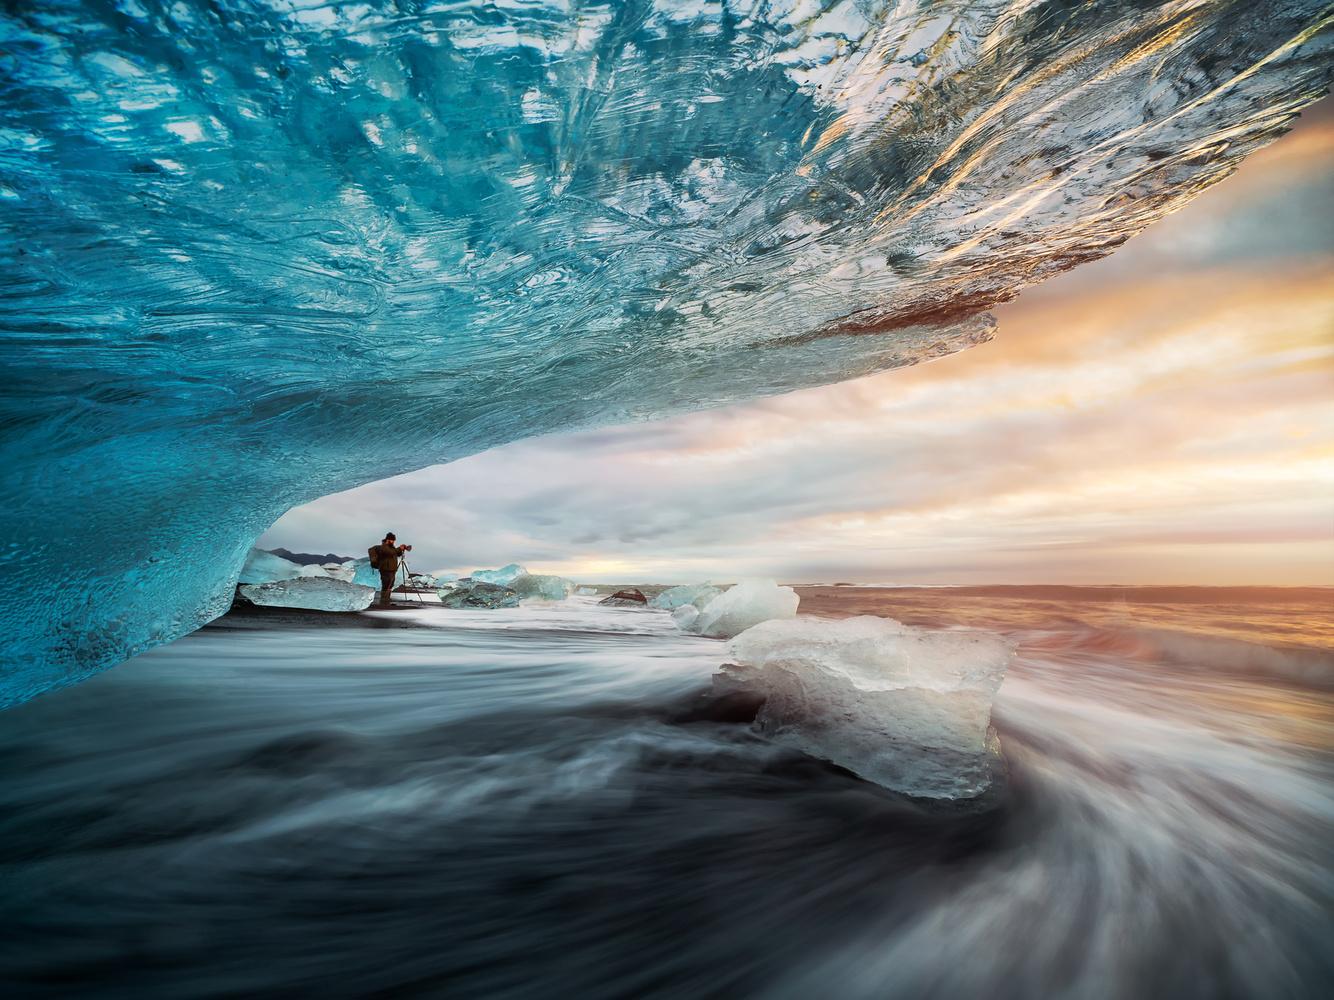 Ice Beach sunrise by Mads Peter Iversen